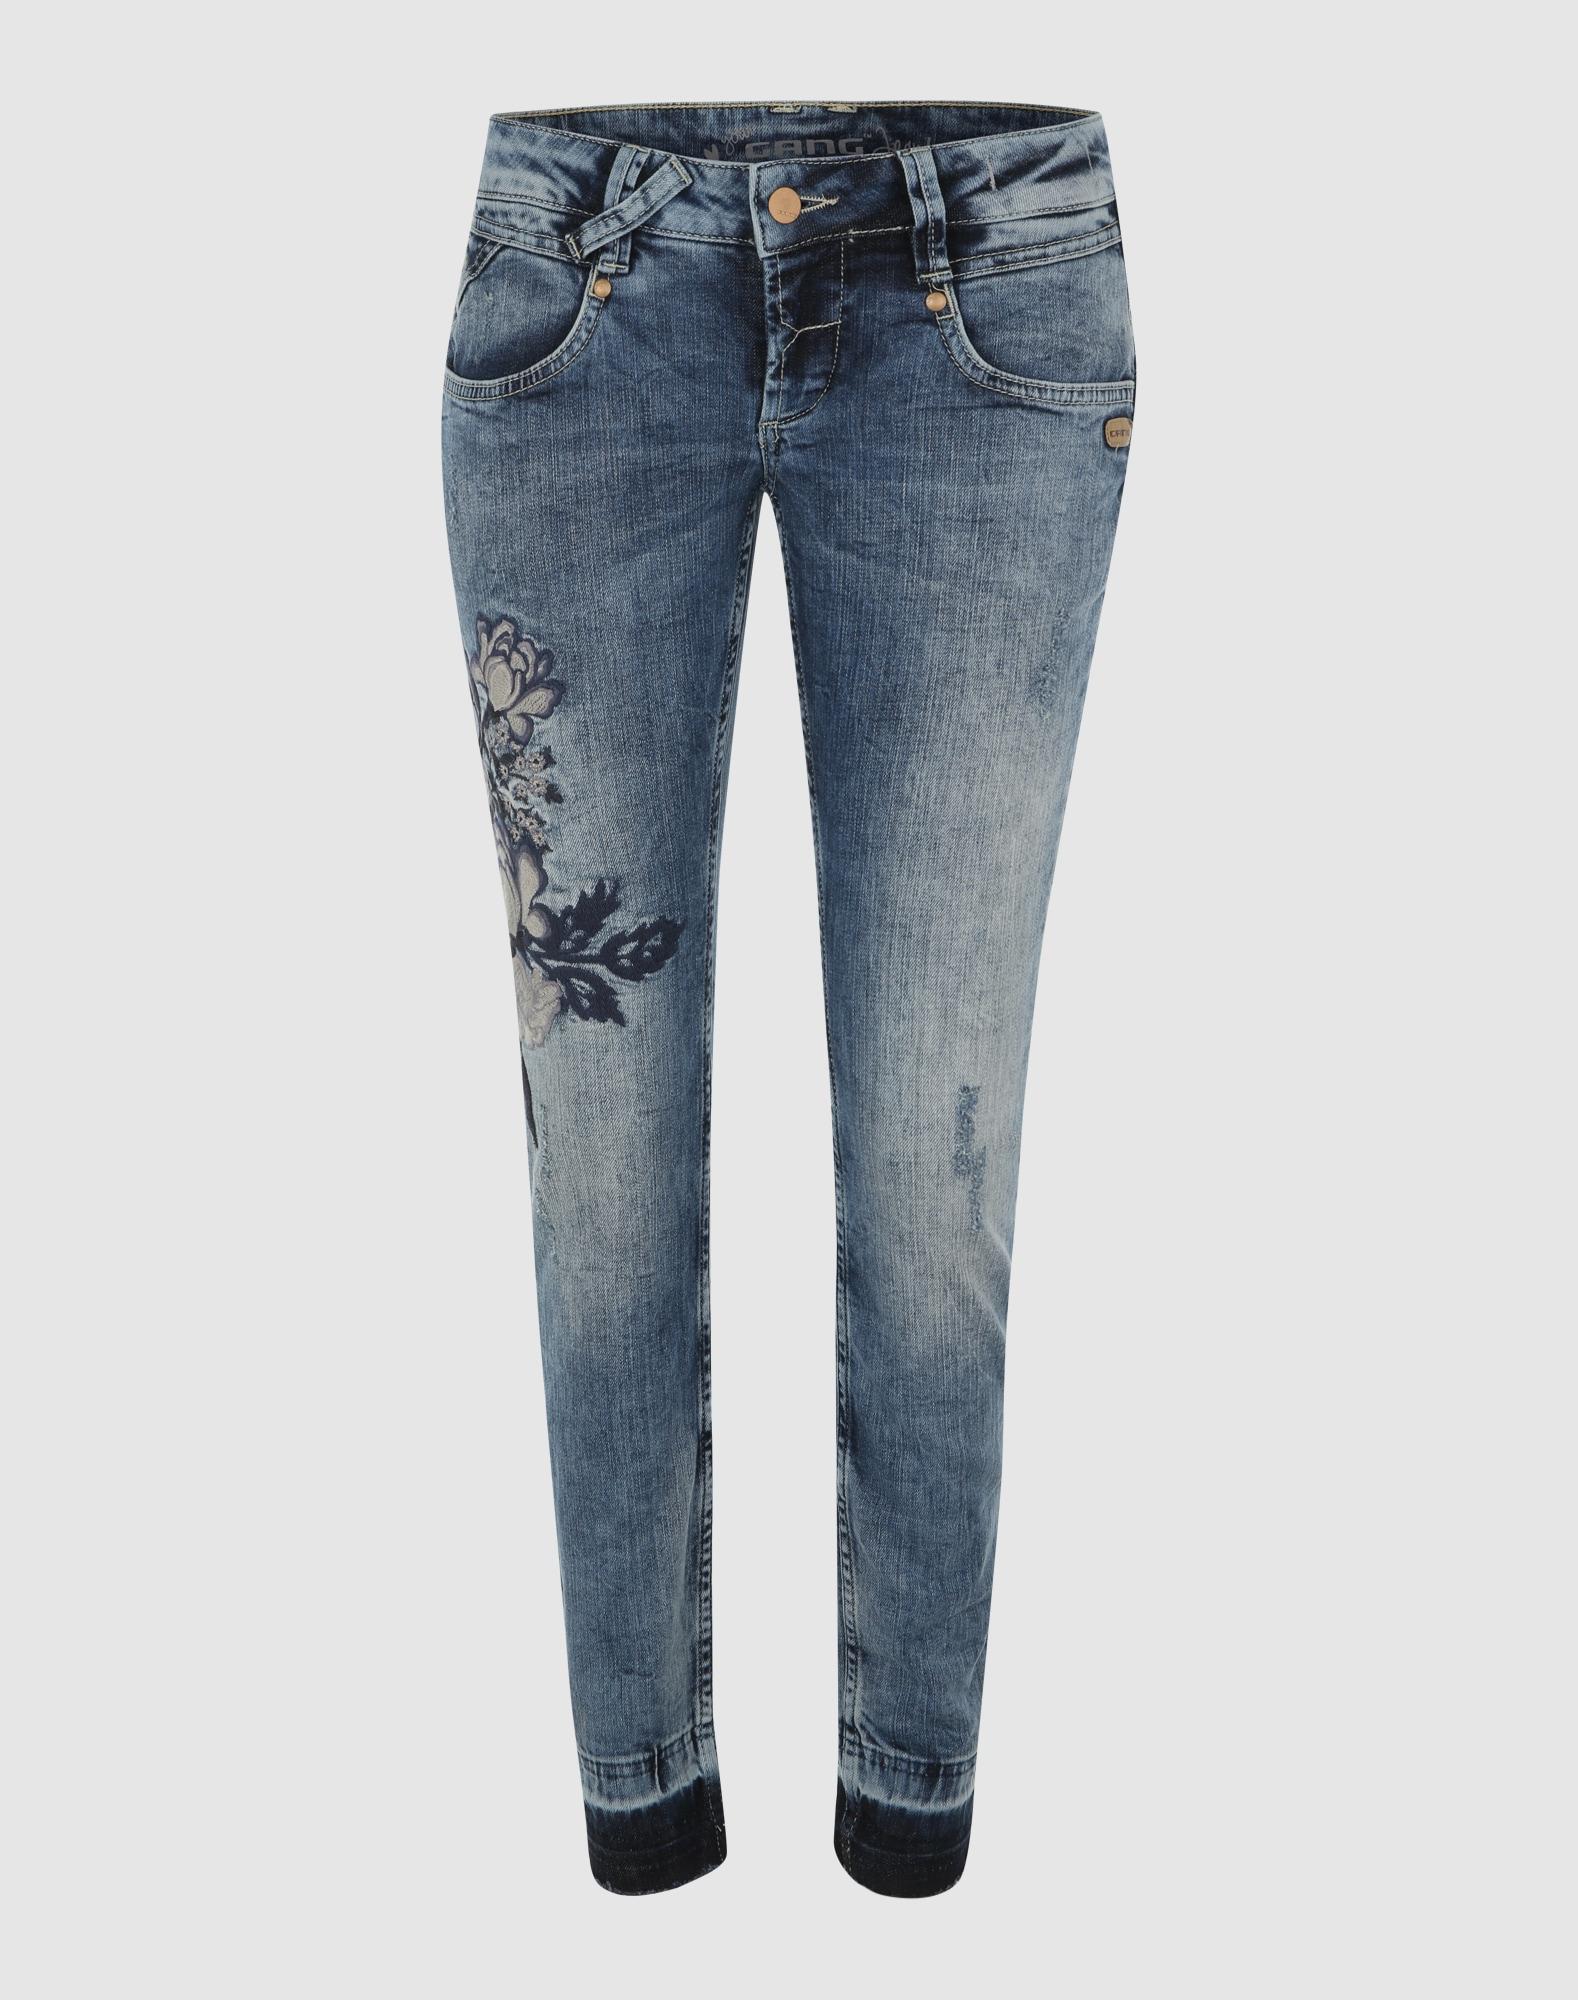 gang jeans 39 nena 39 in blau about you. Black Bedroom Furniture Sets. Home Design Ideas